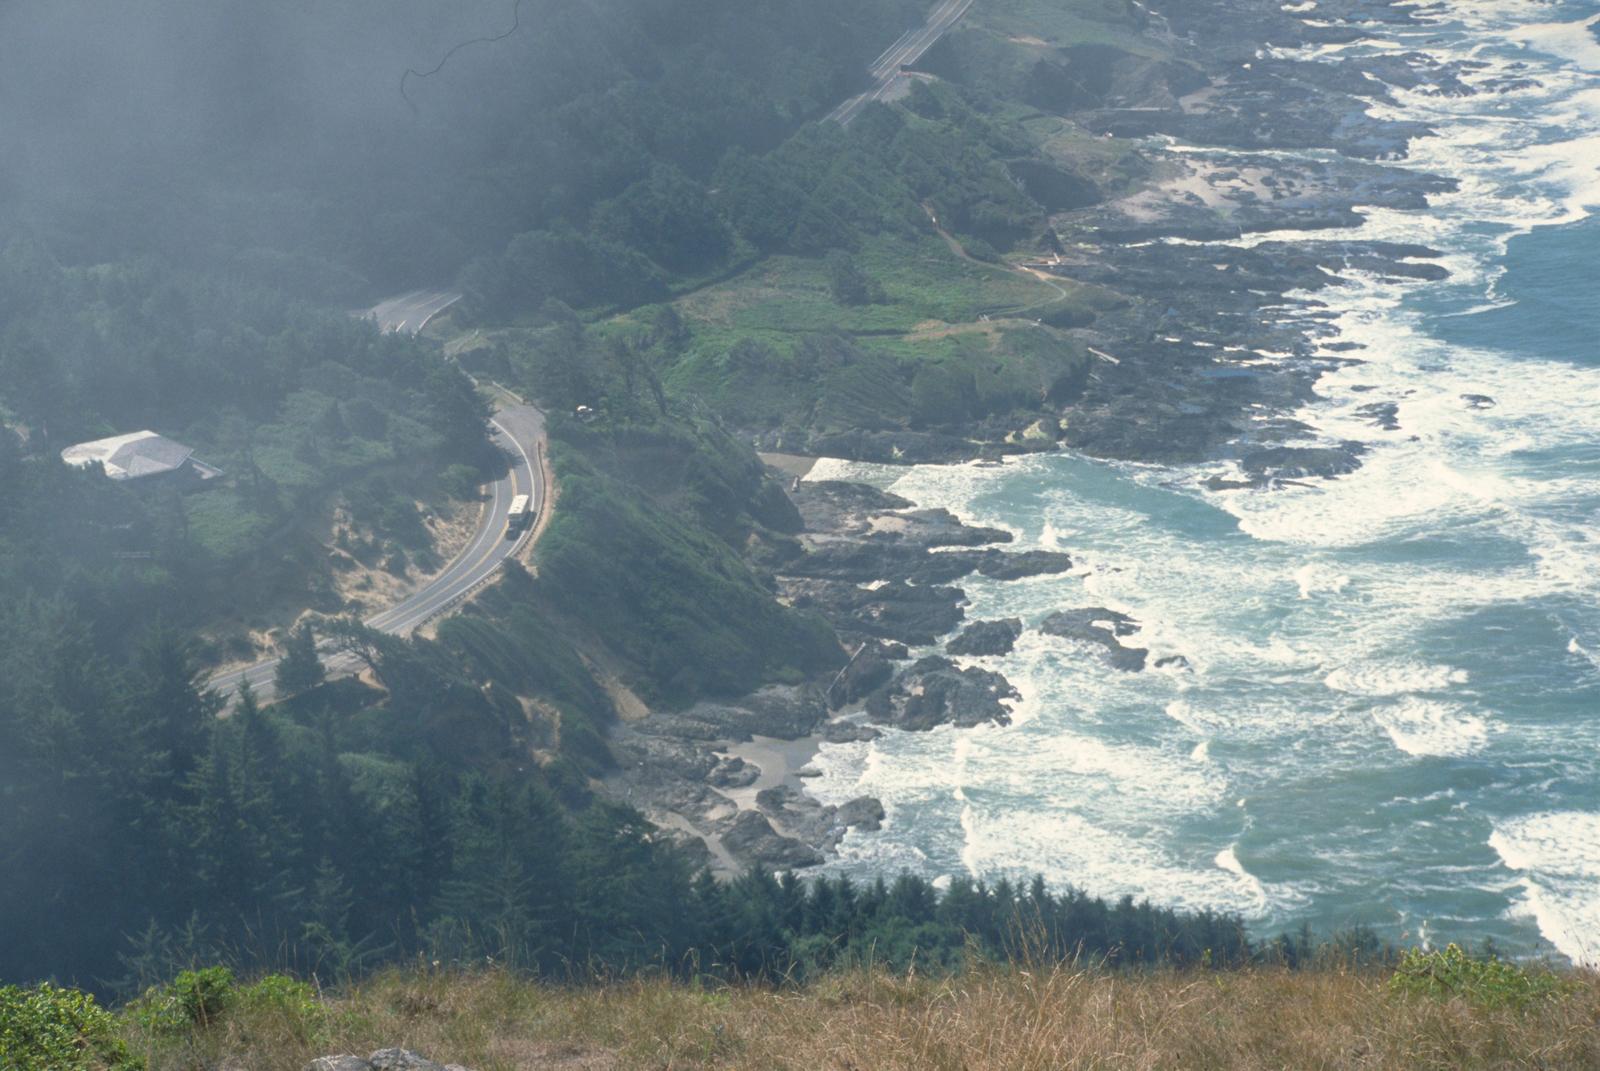 Pacific Coast Scenic Byway - Oregon - Coastal Shores of the Pacific